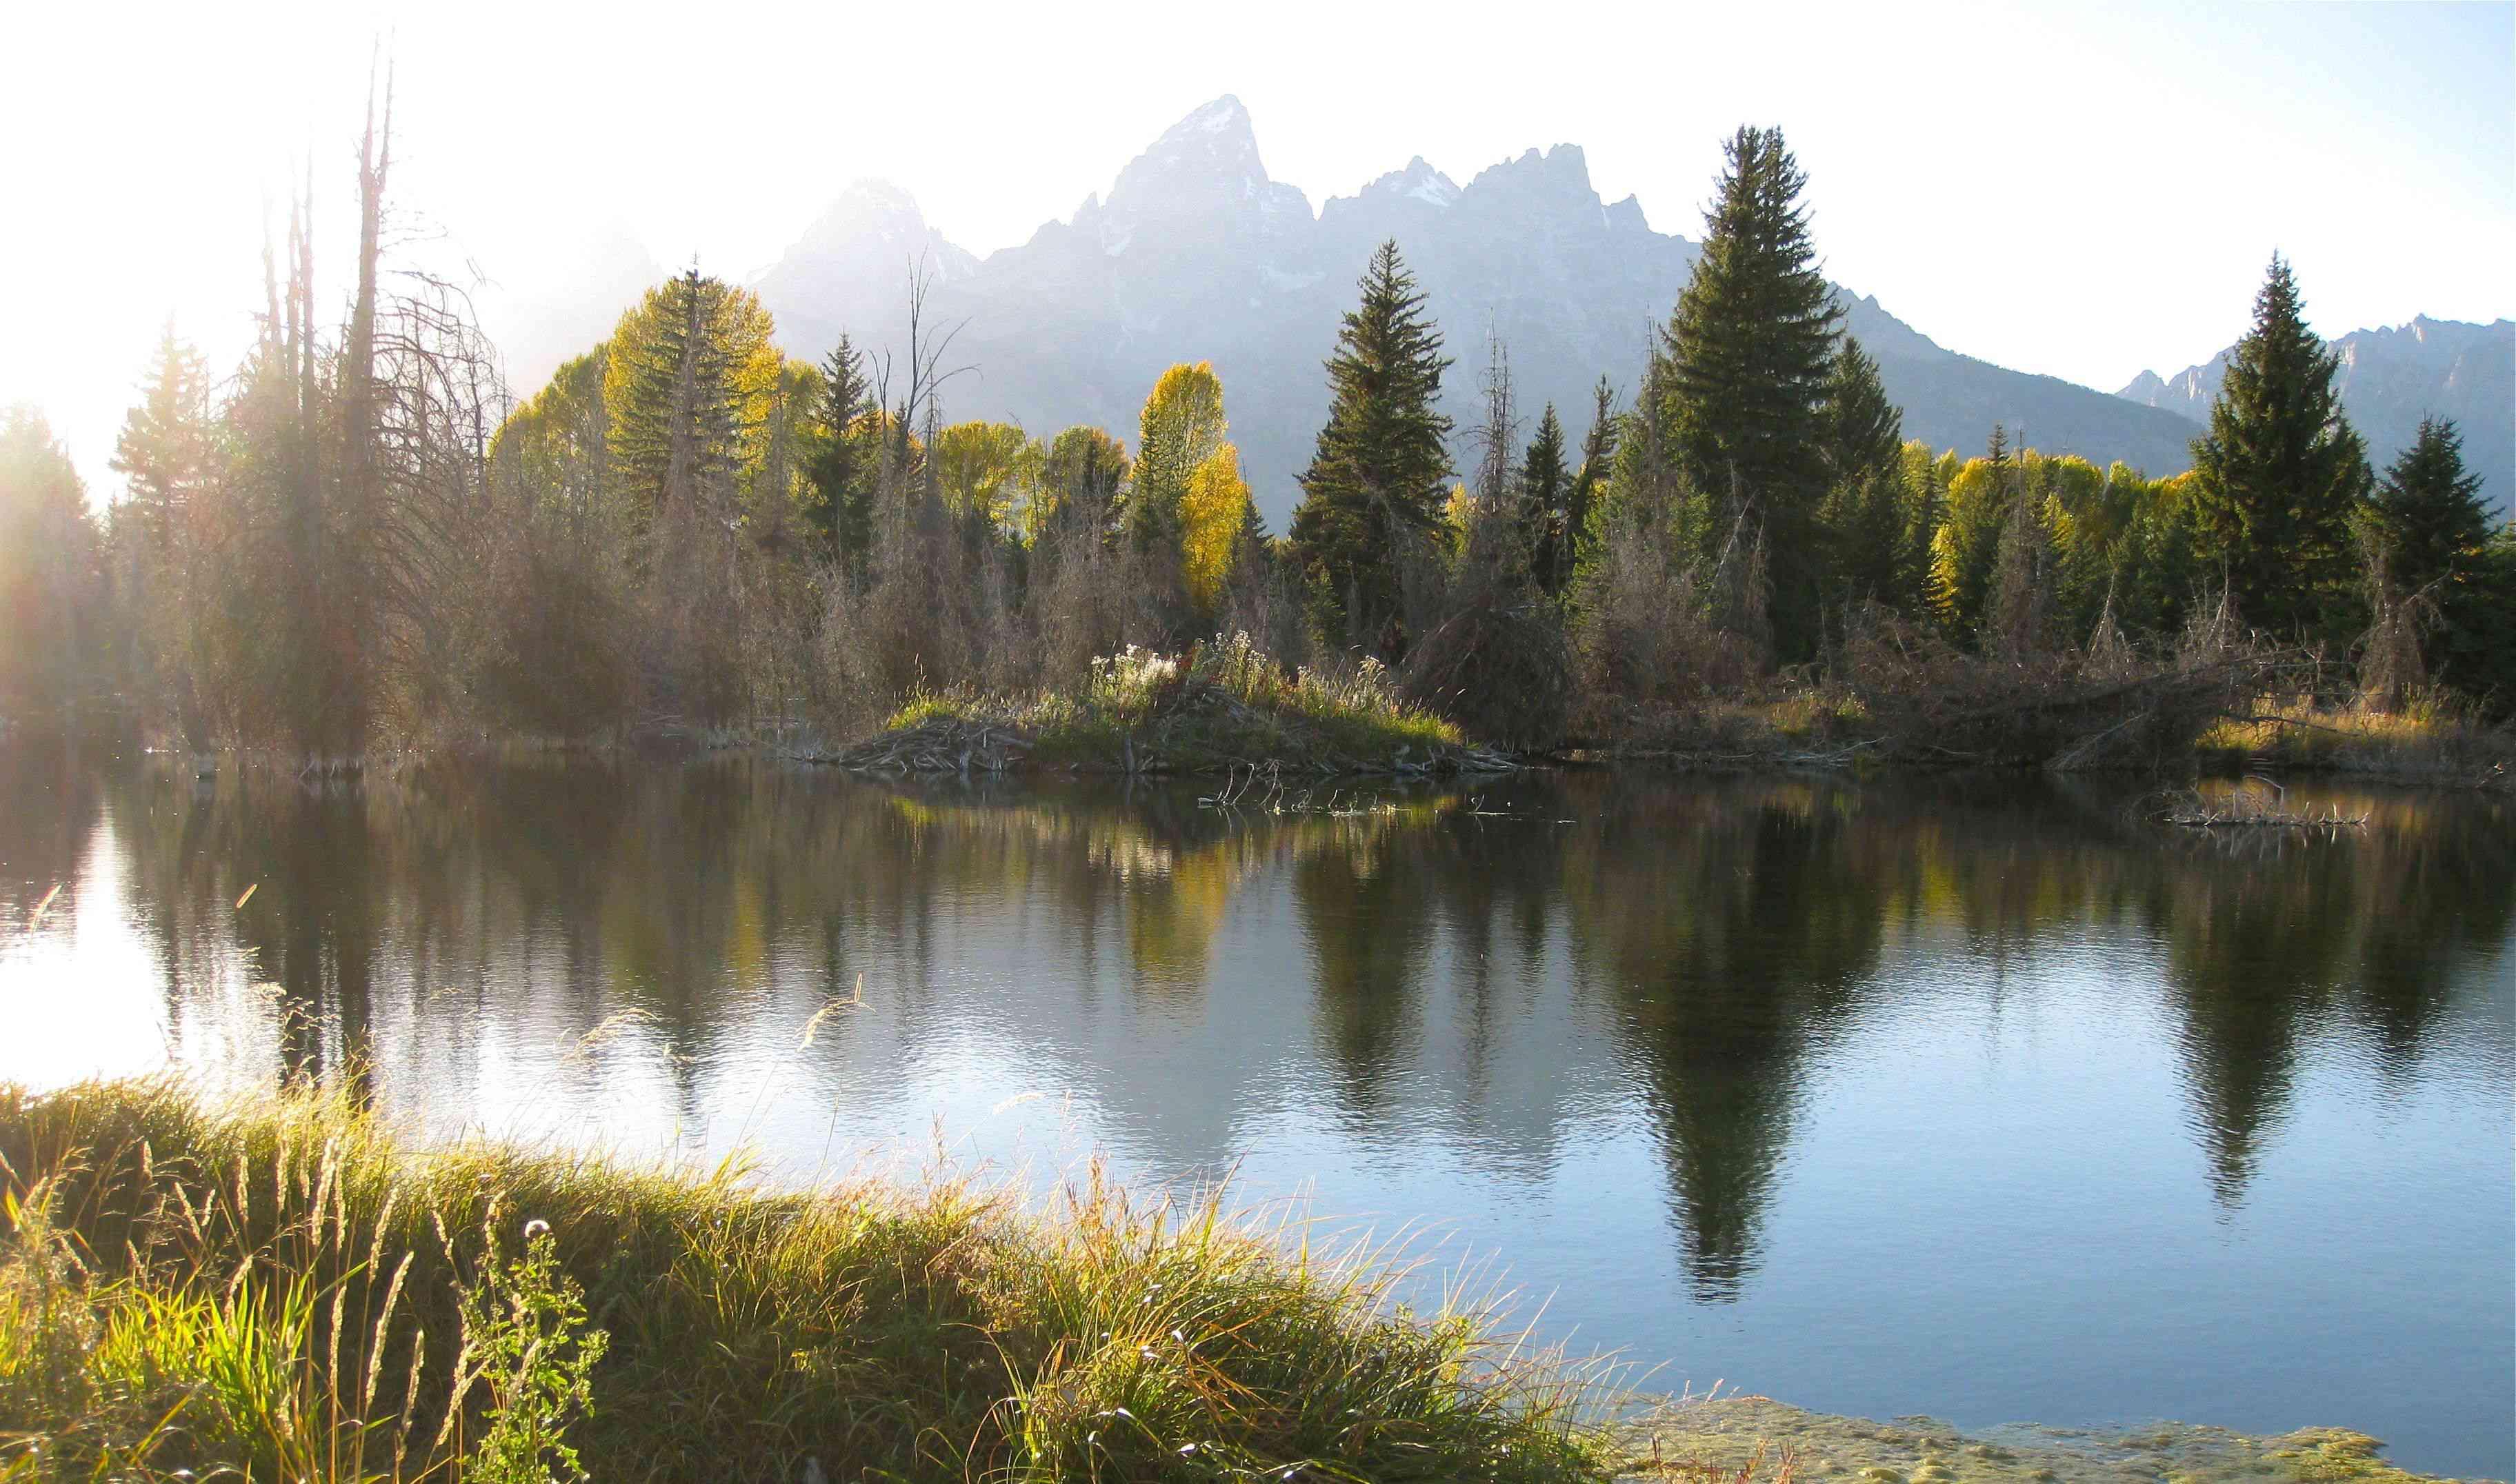 beaver pond in Wyoming